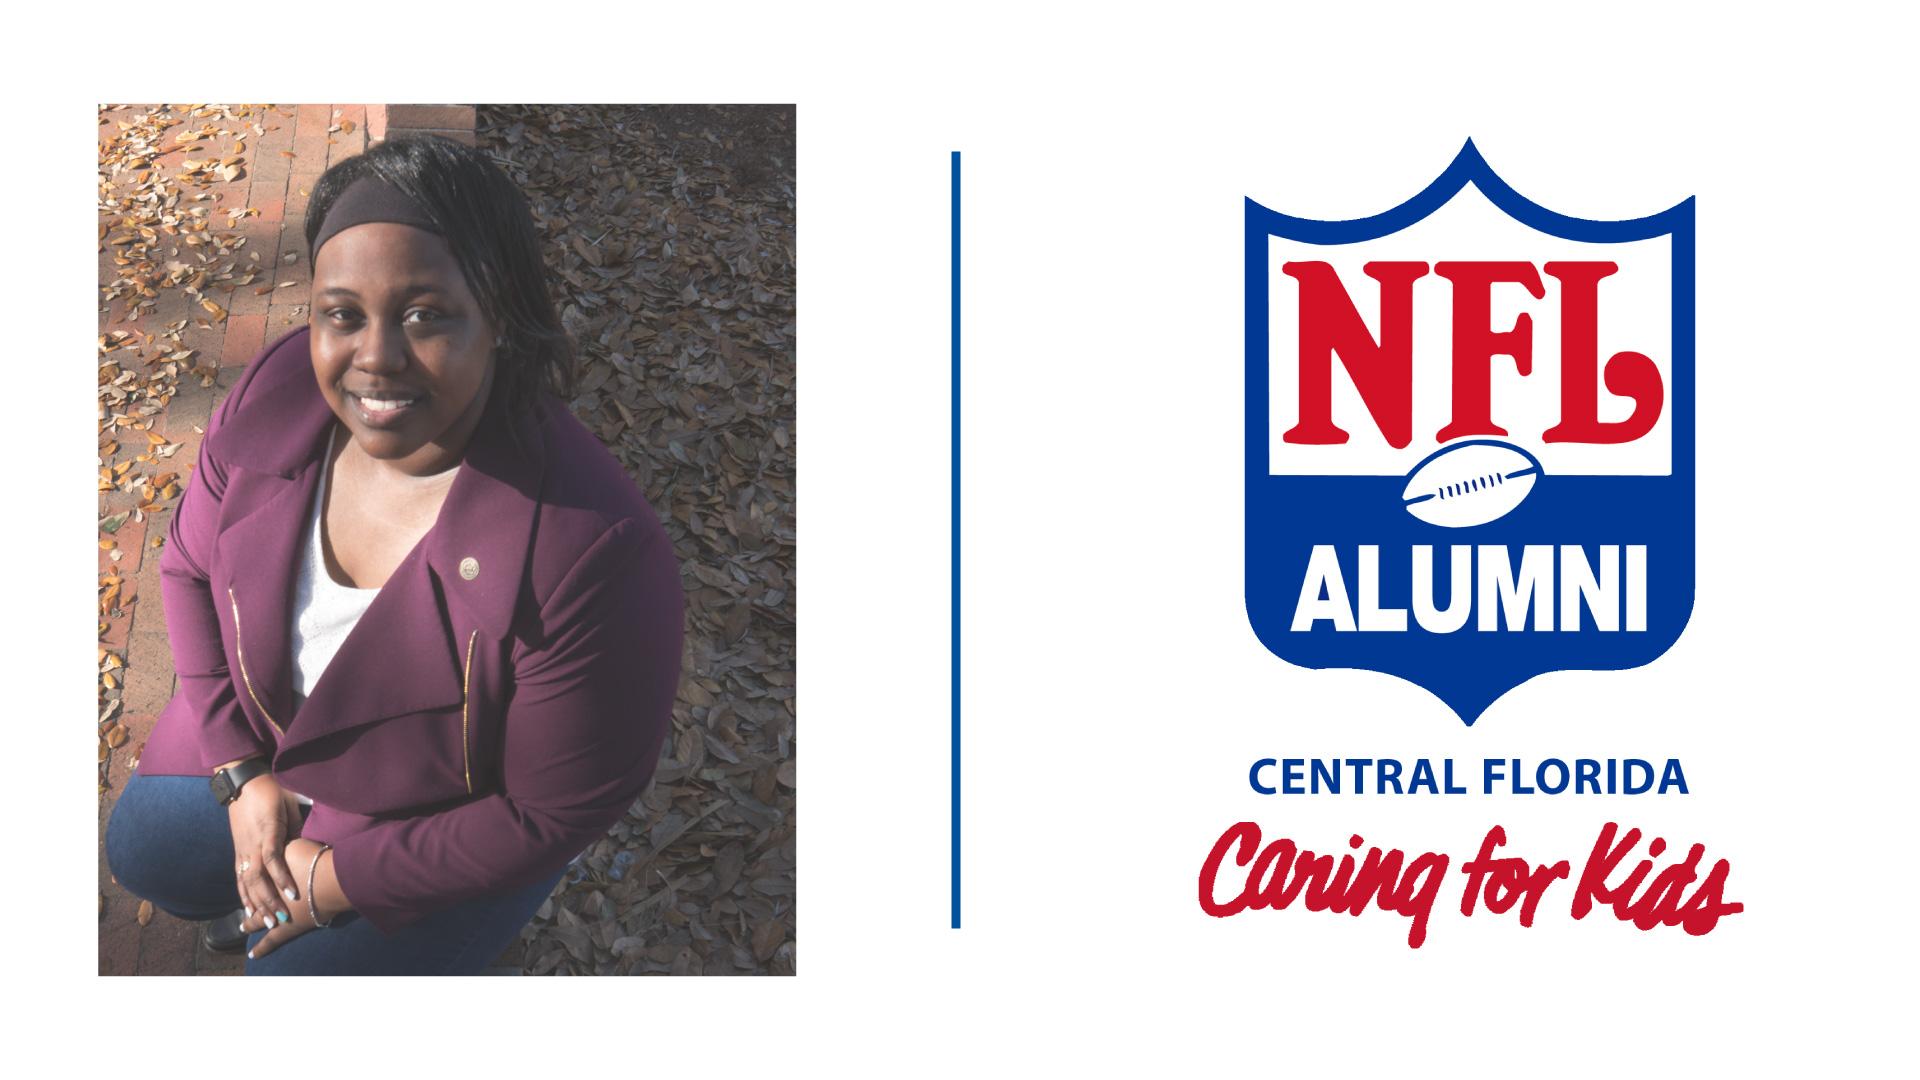 Image via Asia McMillan/NFL Alumni Central Florida Chapter